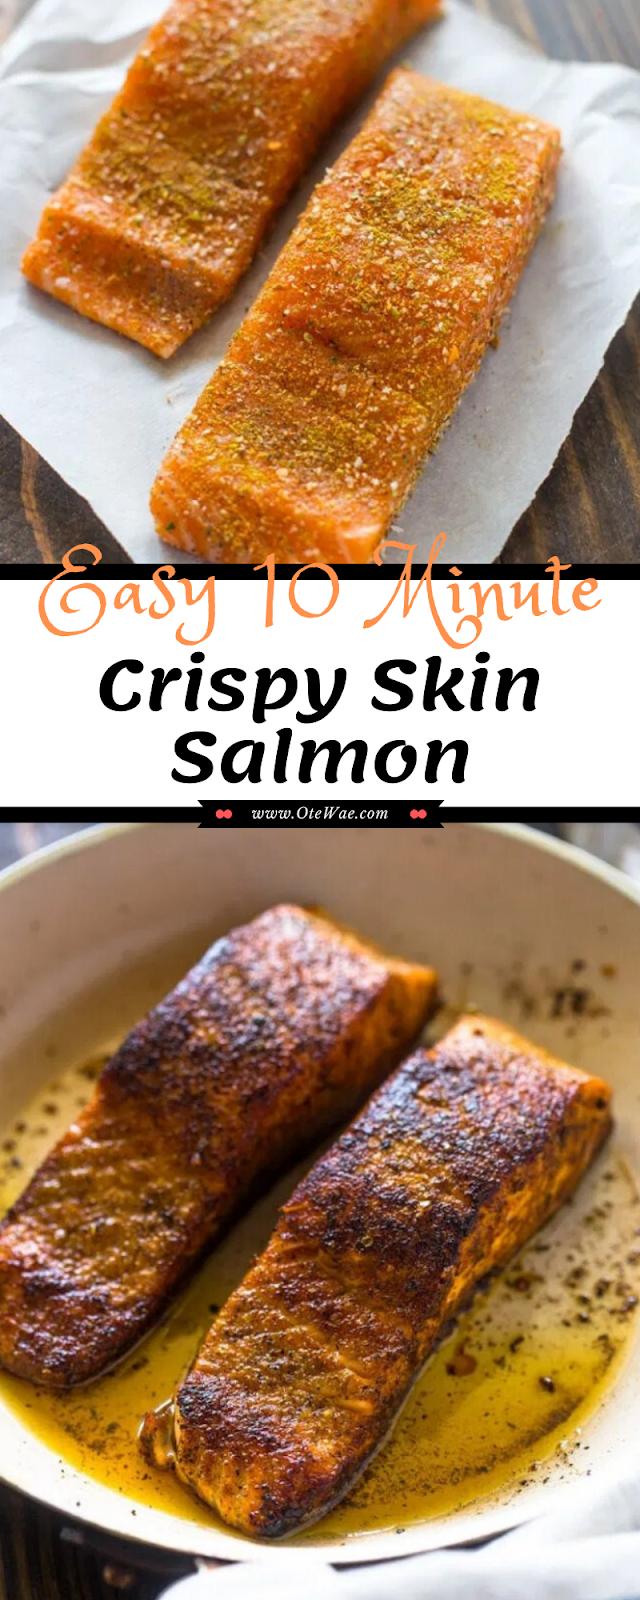 Easy 10 Minute Crispy Skin Salmon